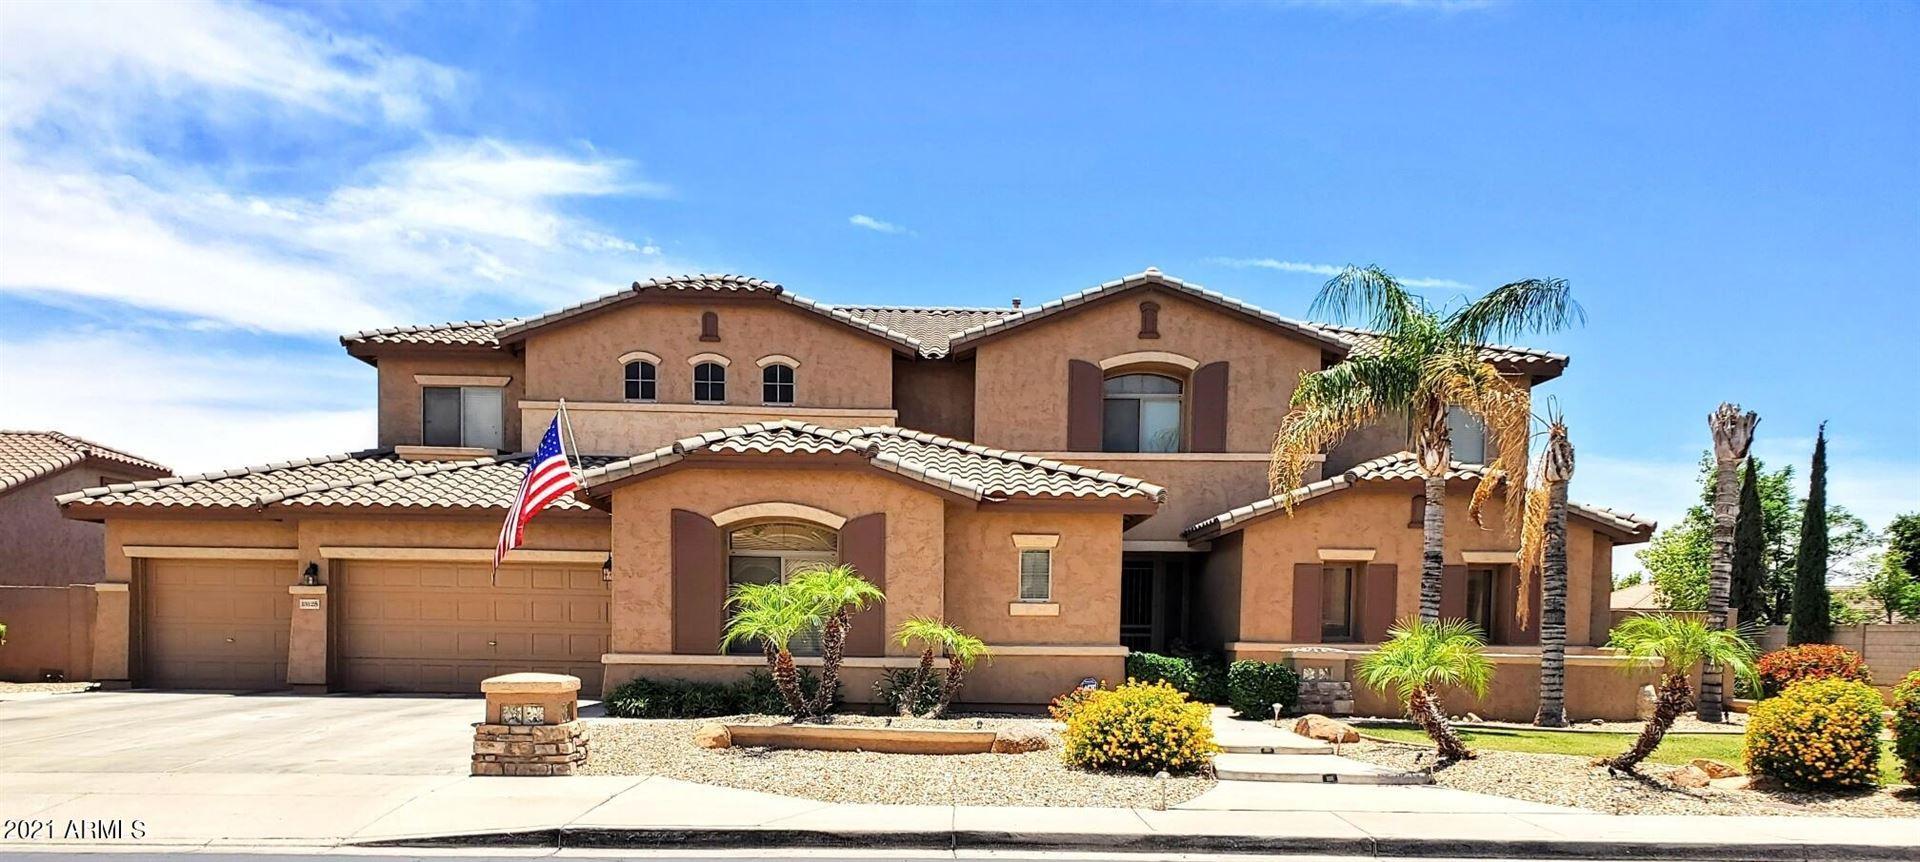 13125 W SOLANO Drive, Litchfield Park, AZ 85340 - MLS#: 6247640